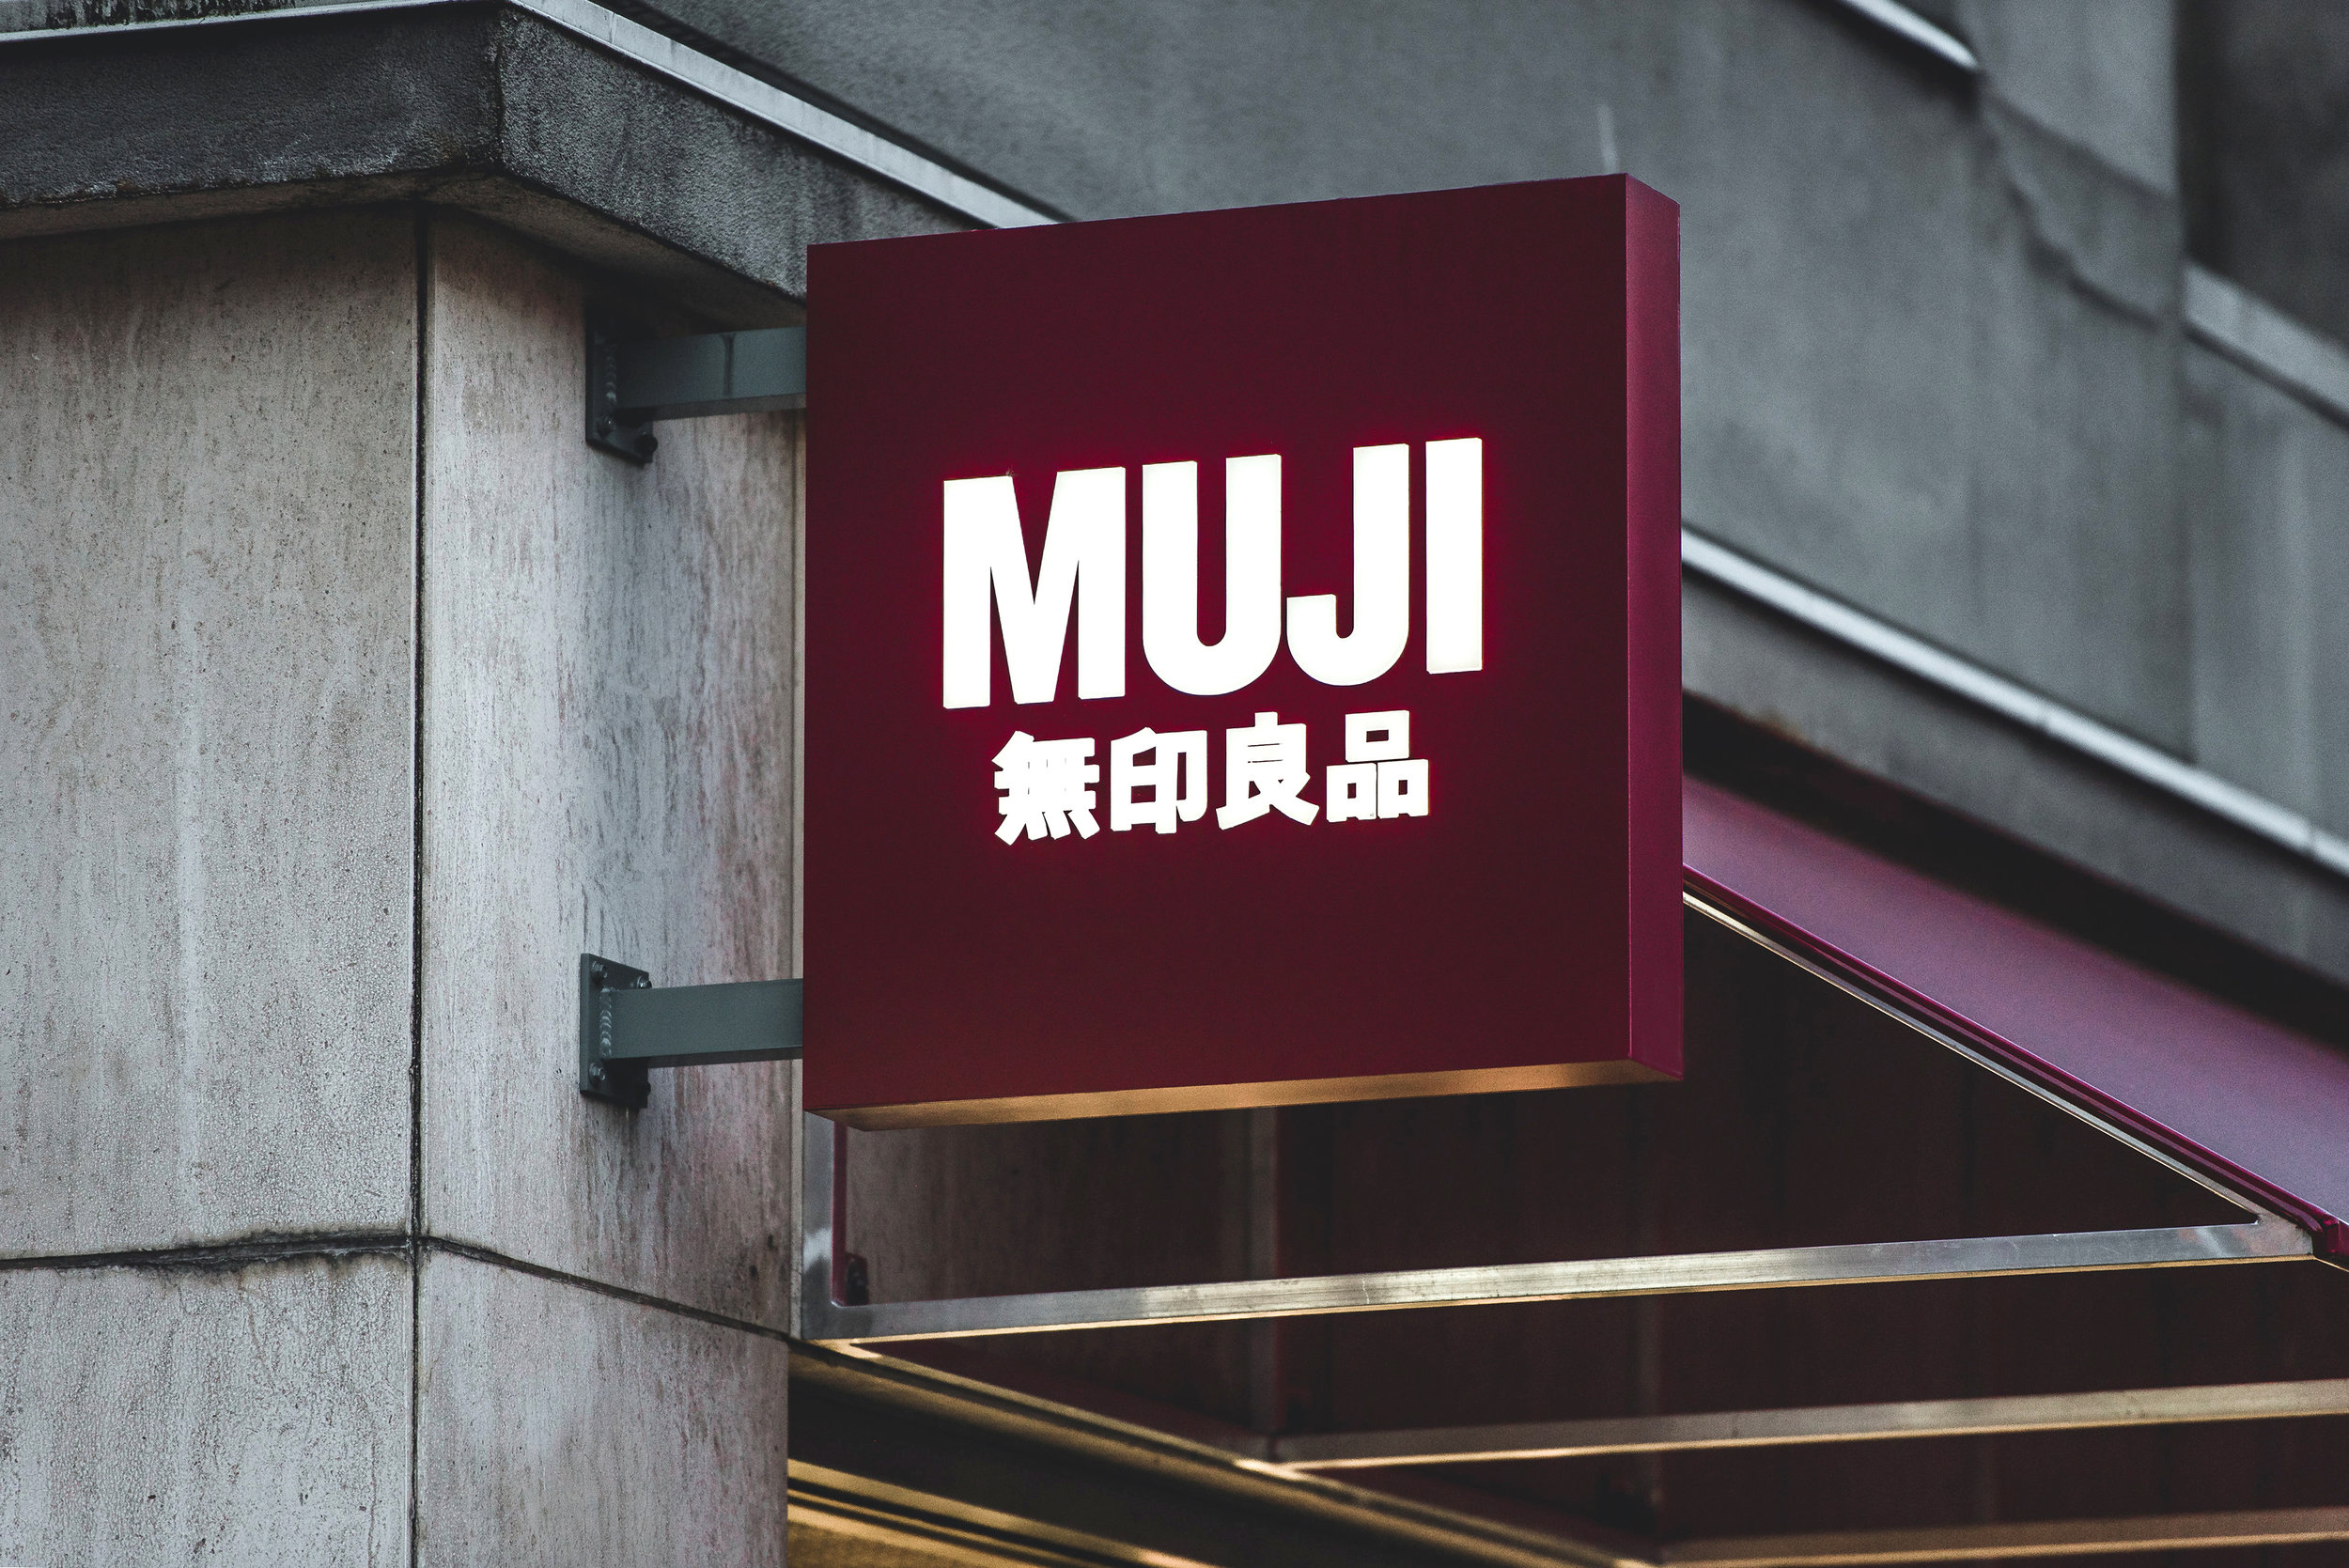 Muji-0005-edit.jpg